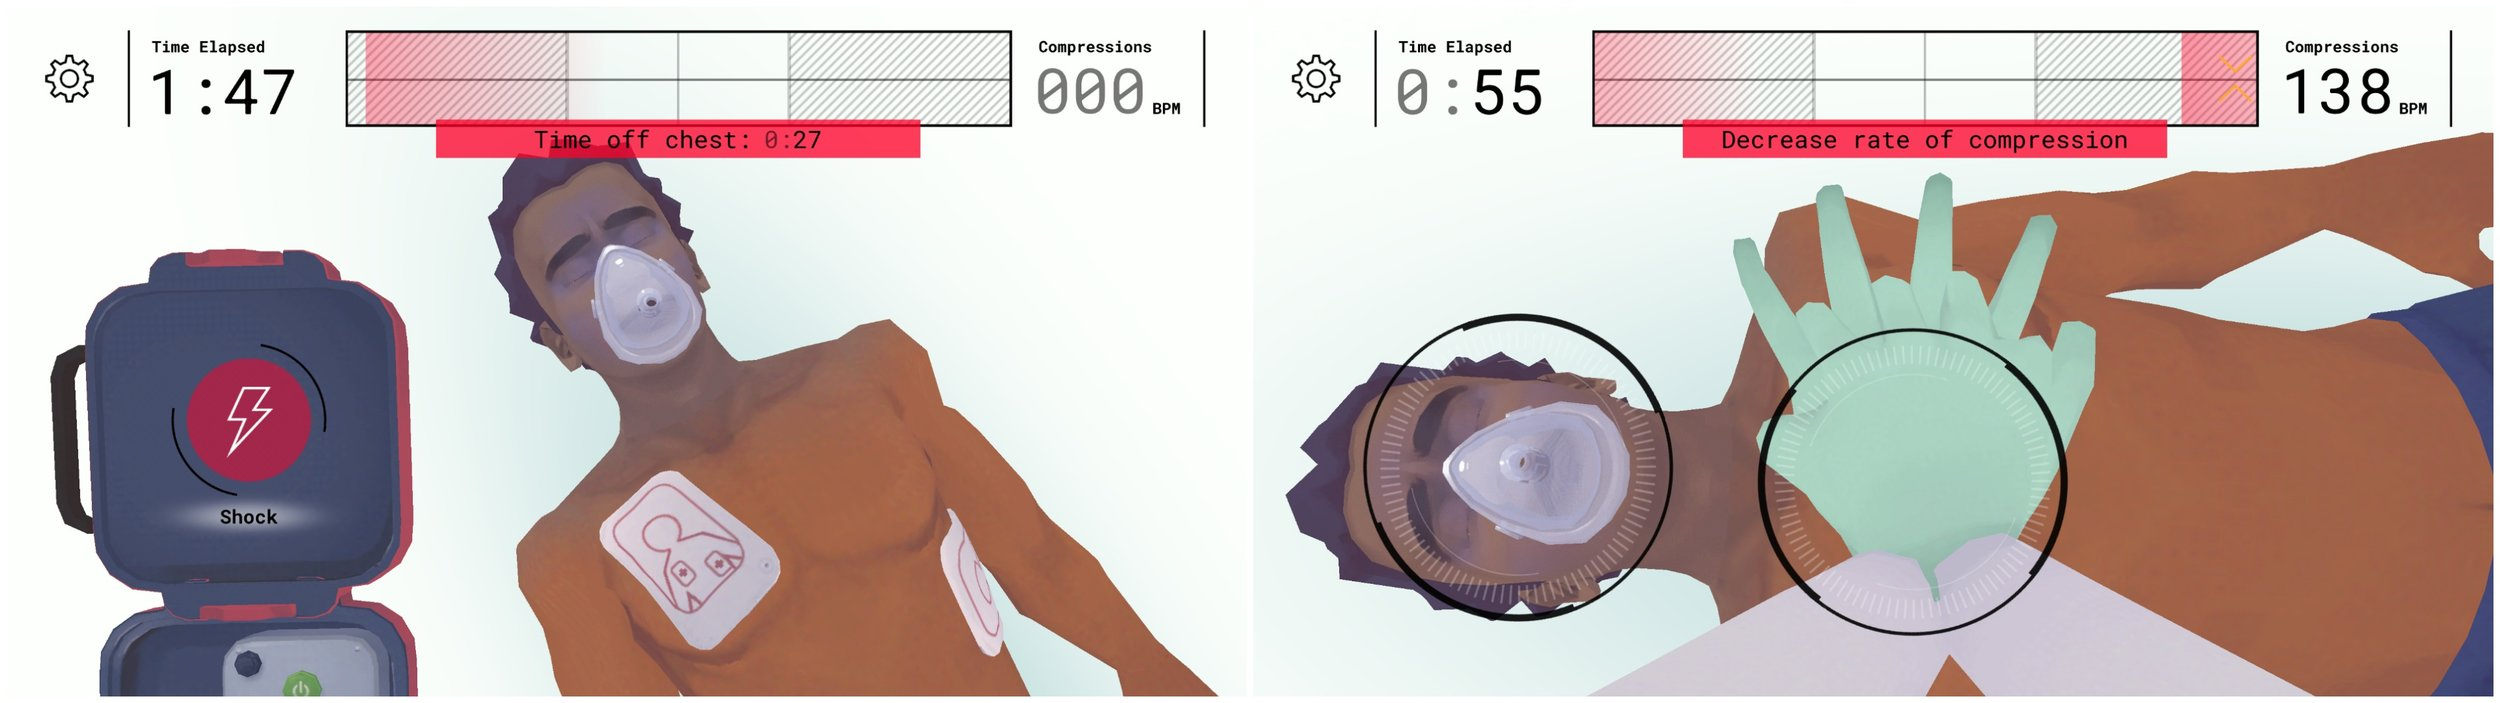 Saving Lives screenshots.jpg